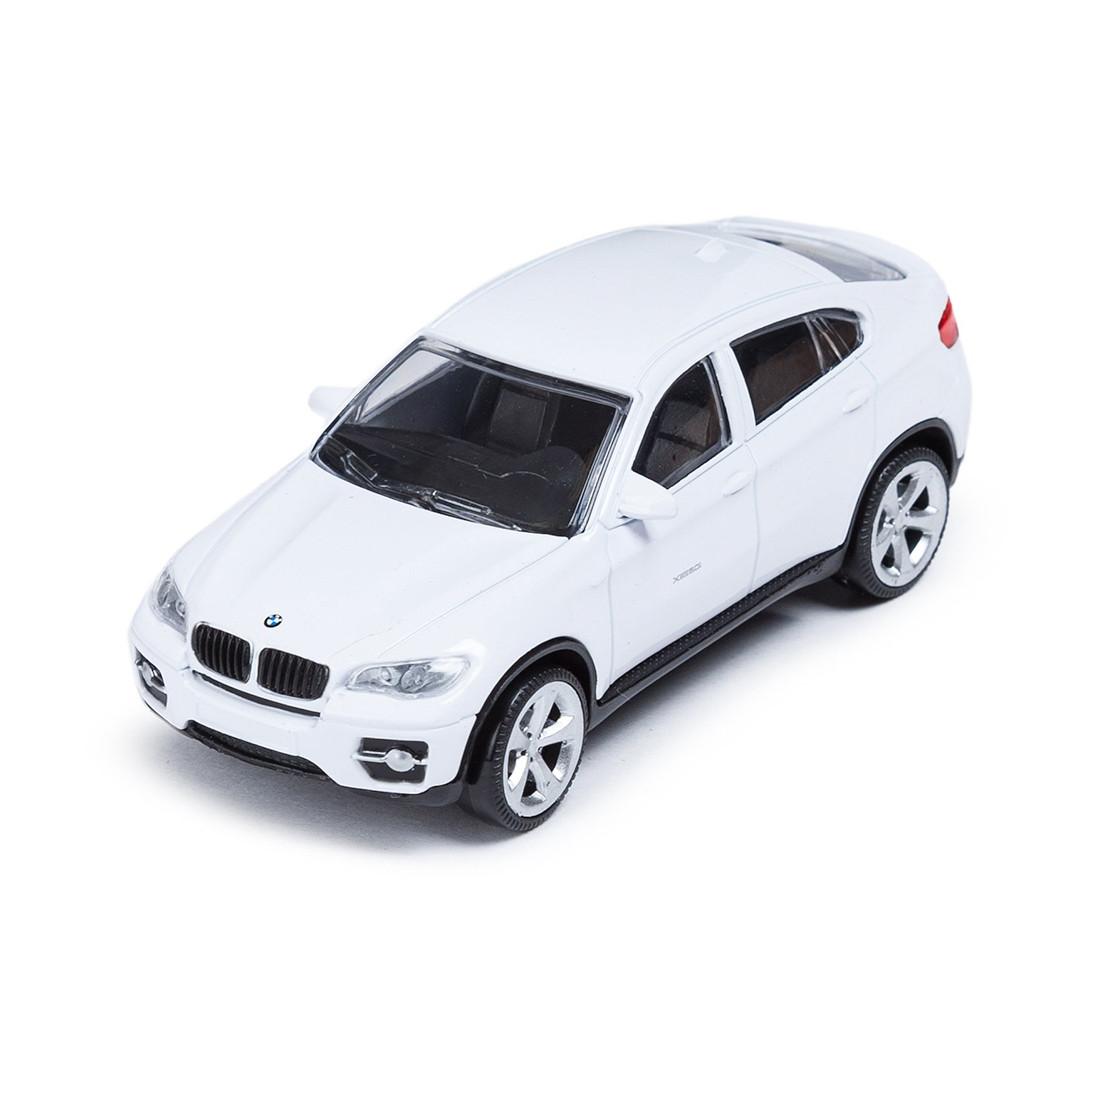 Металлическая машинка RASTAR 33700W BMW X6 (11 см, White)